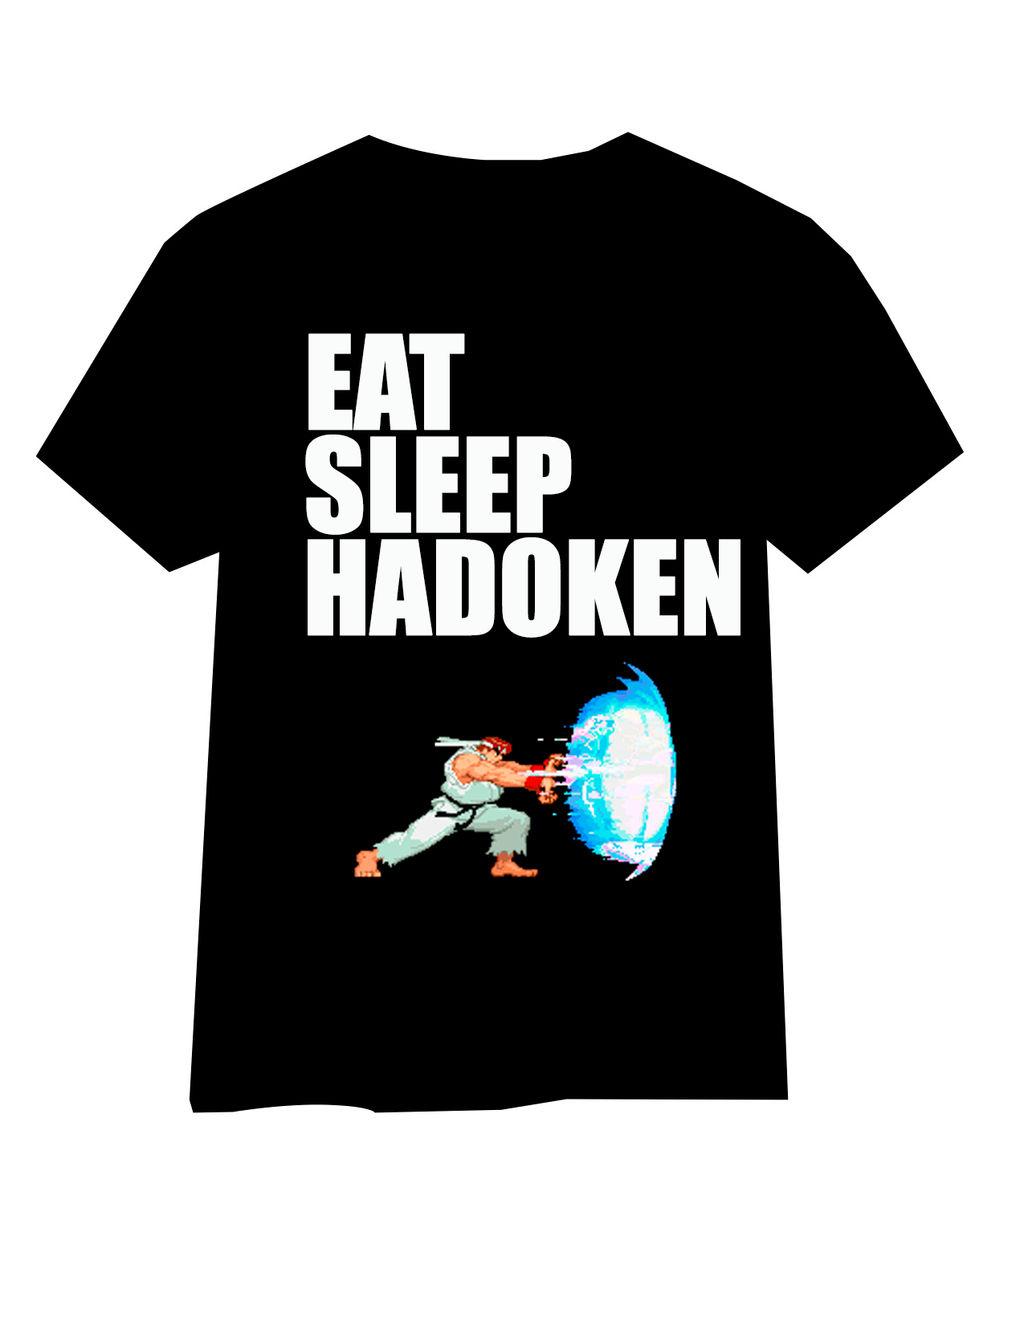 Eat Sleep Hadoken/Hadouken - T Shirt design by oo2k15 on